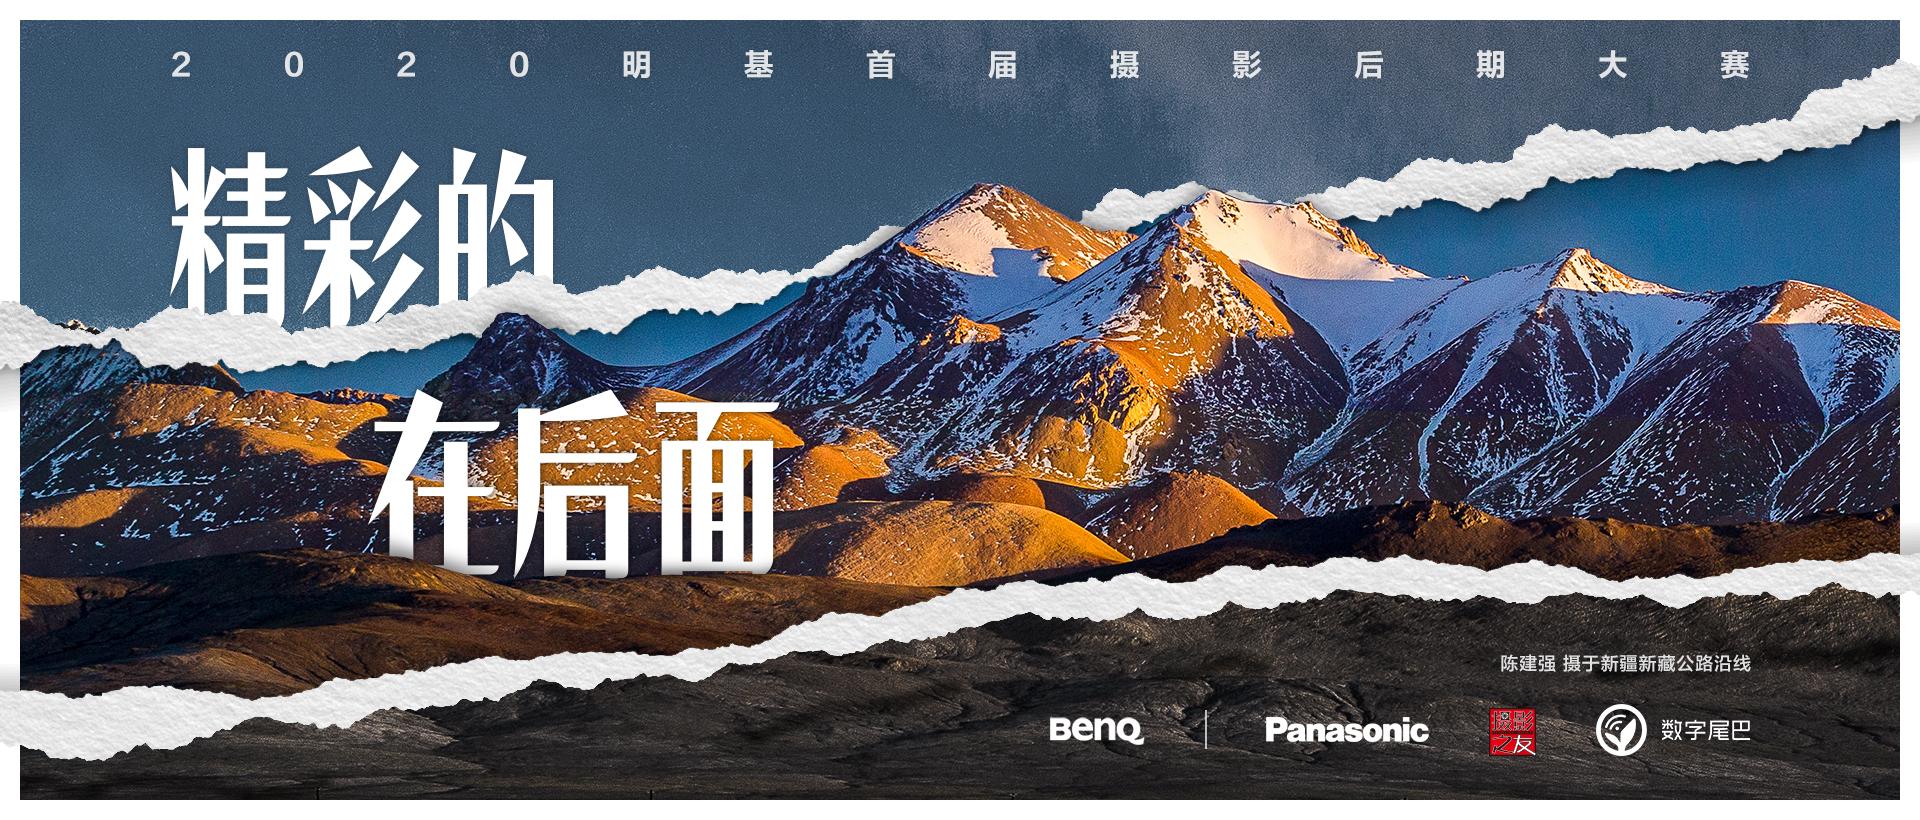 官网电脑端banner-1920-8200518